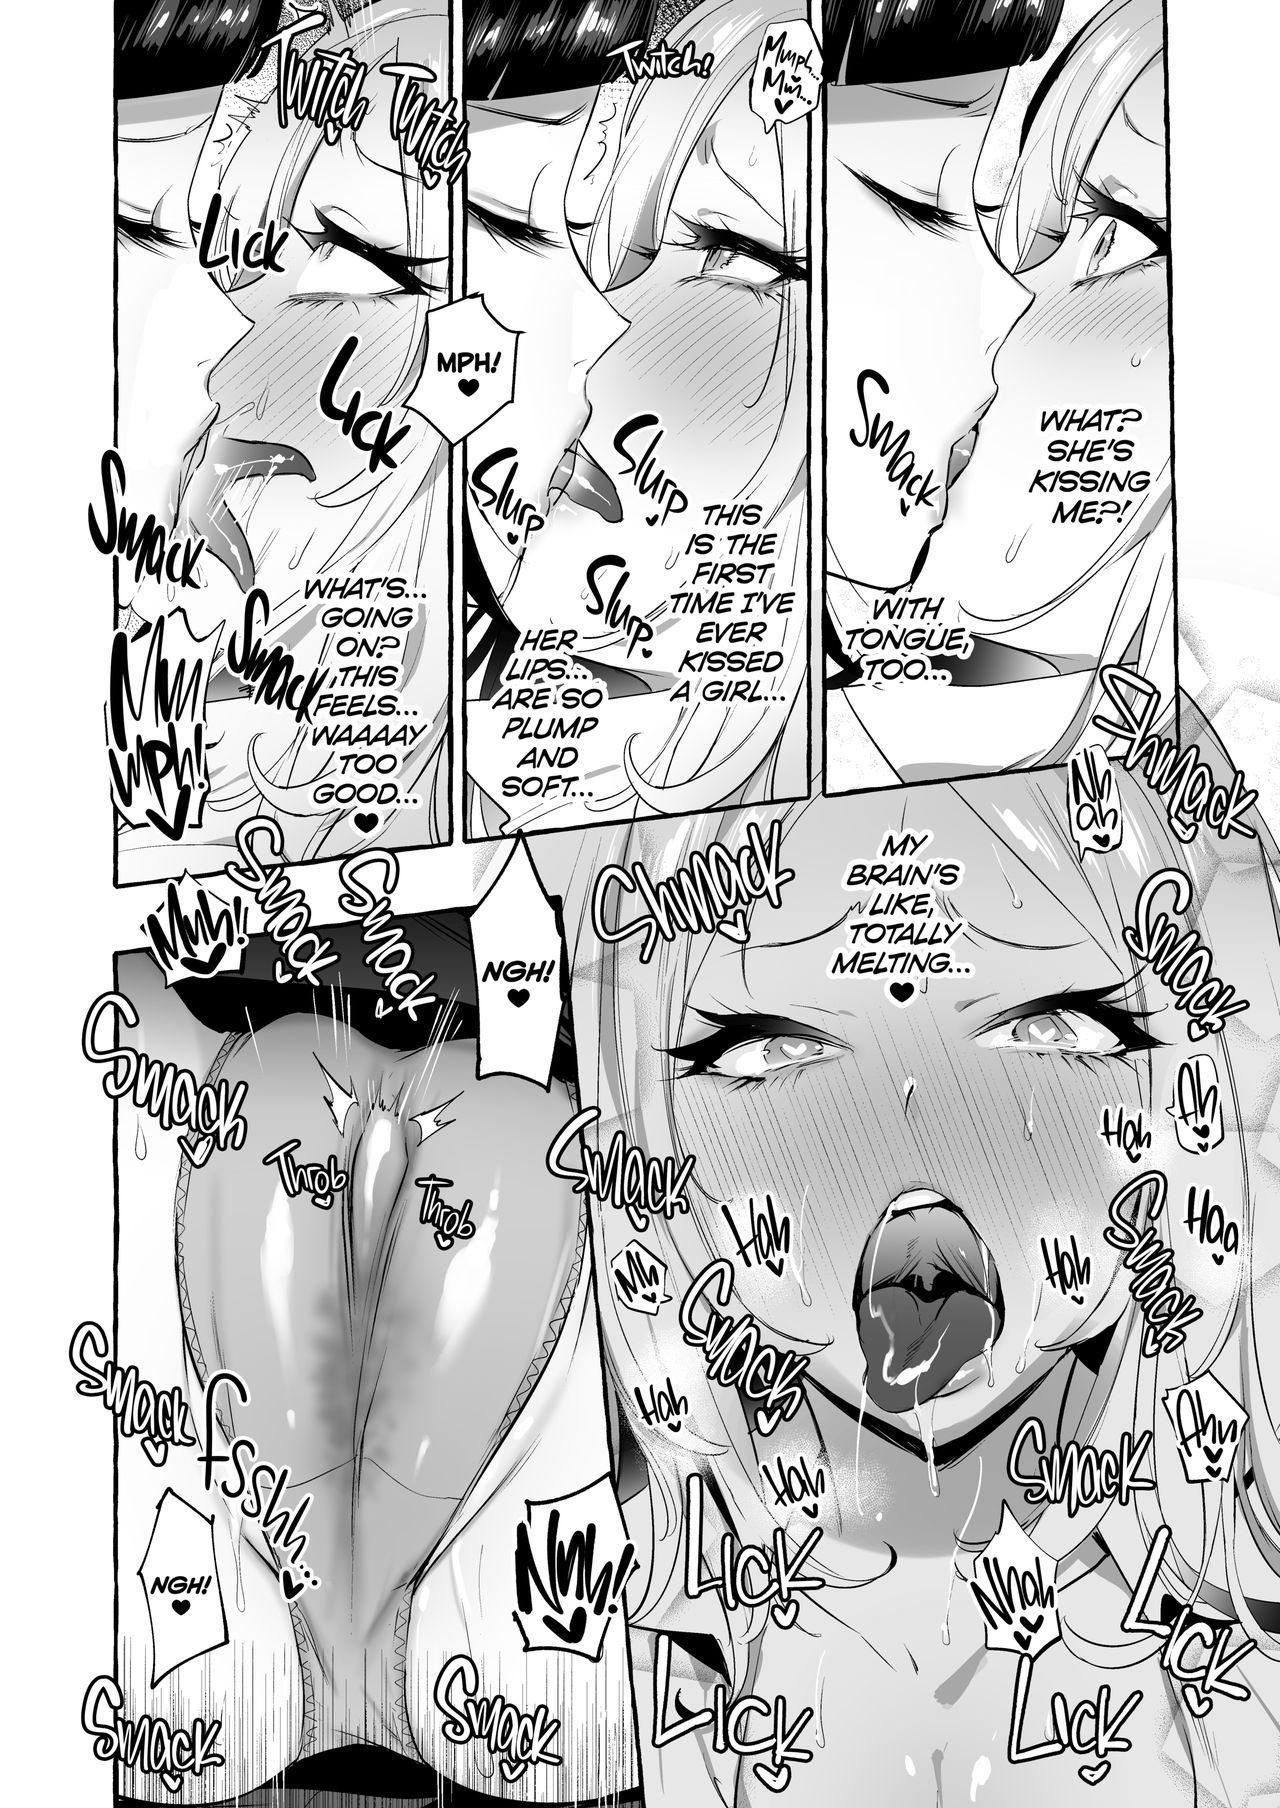 [Hibon (Itami)] Futanari-san to Nonke-san   Straight Girl Meets Futa [English] [2d-market.com] [Decensored] [Digital] 16